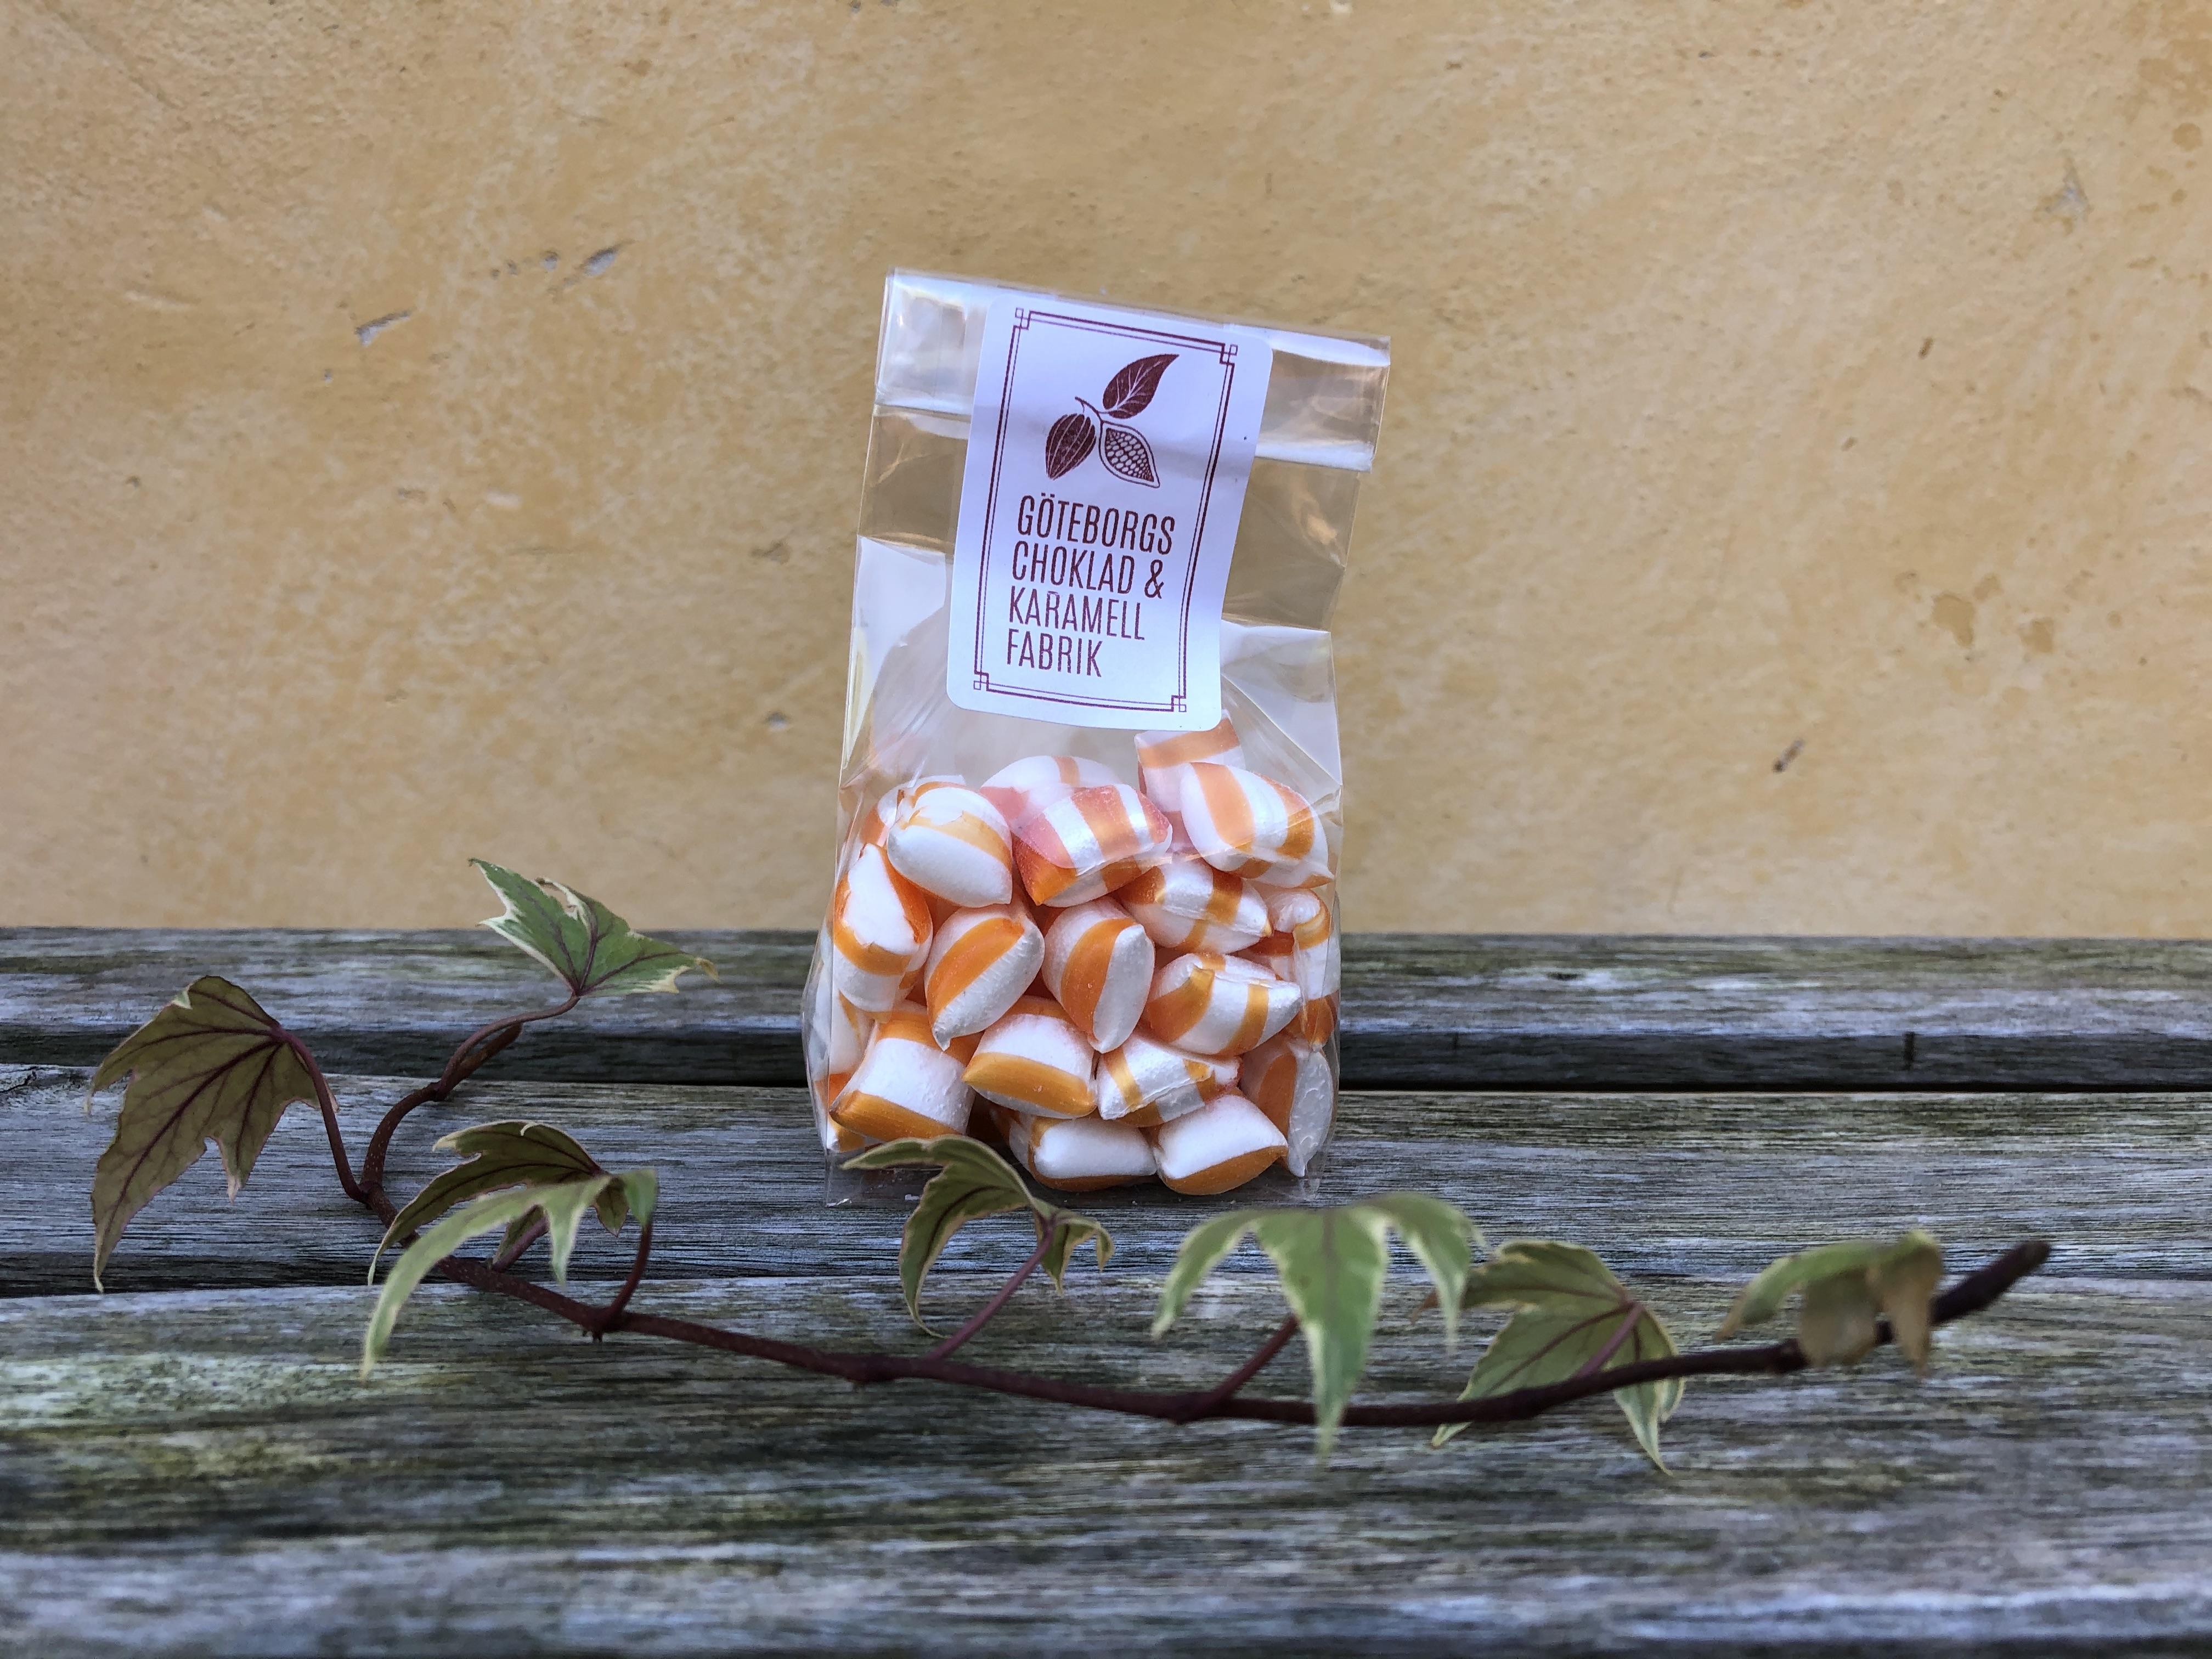 Hårda karameller